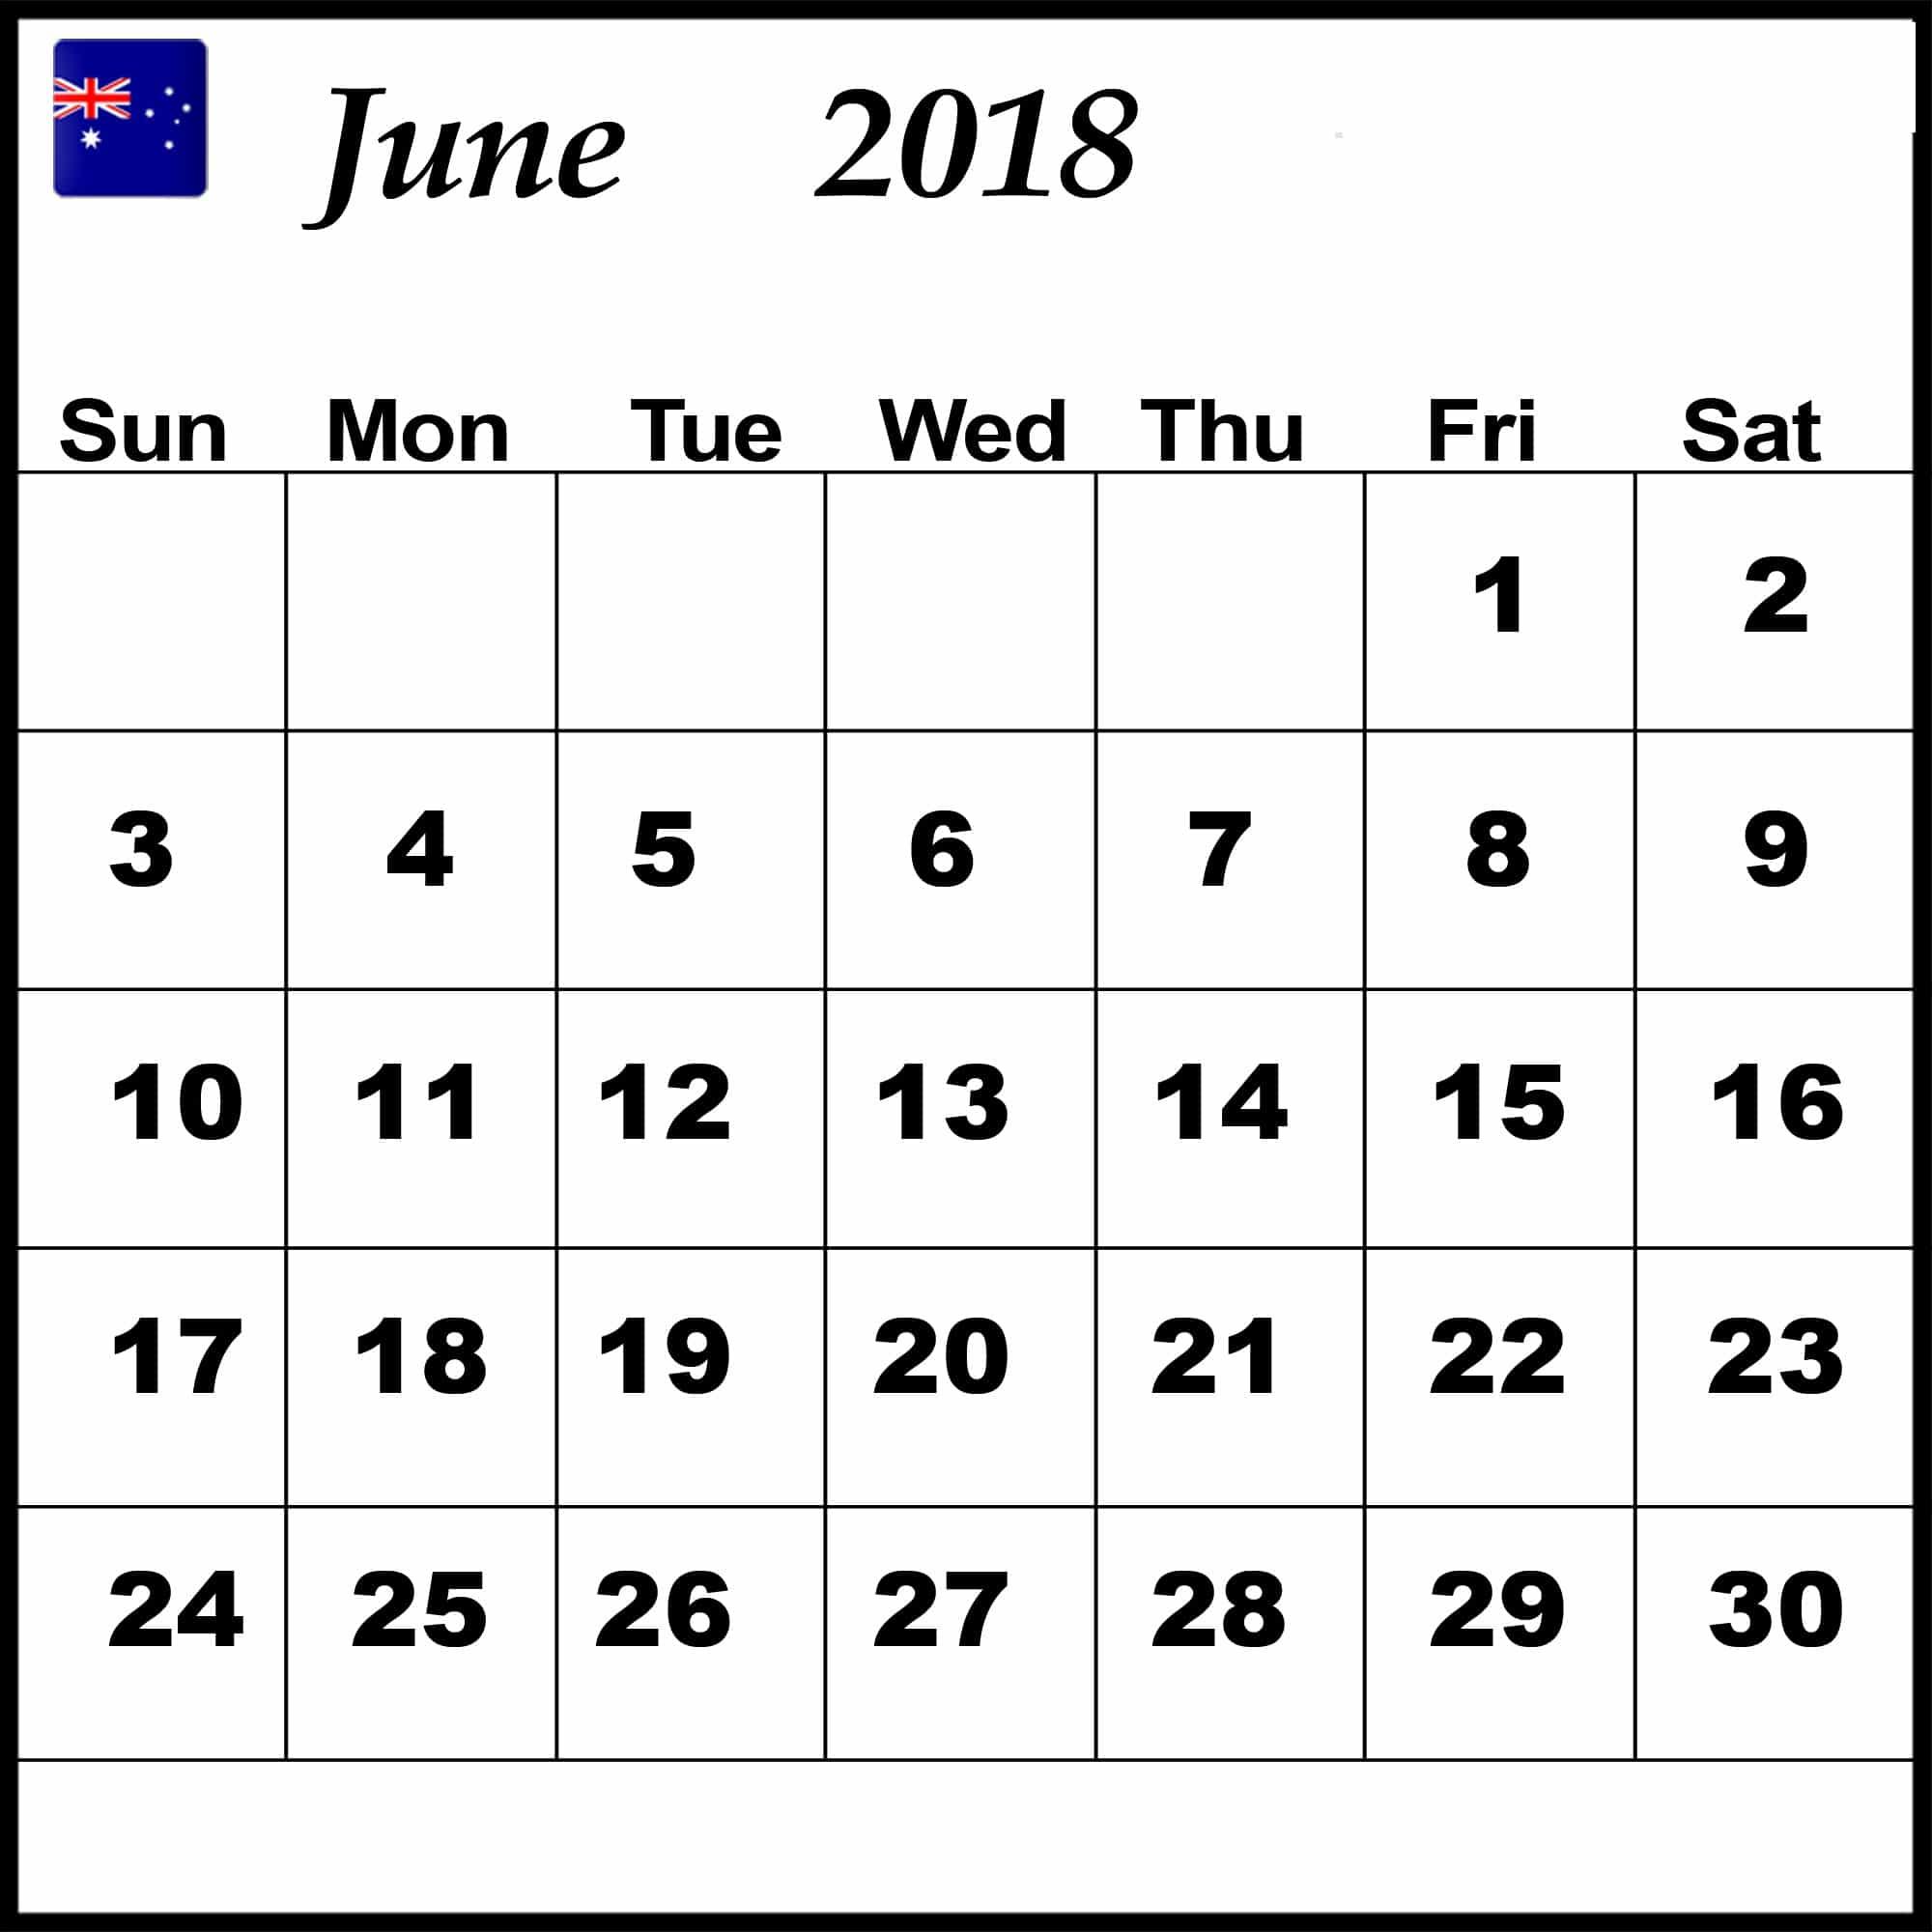 June 2018 Calendar Australia